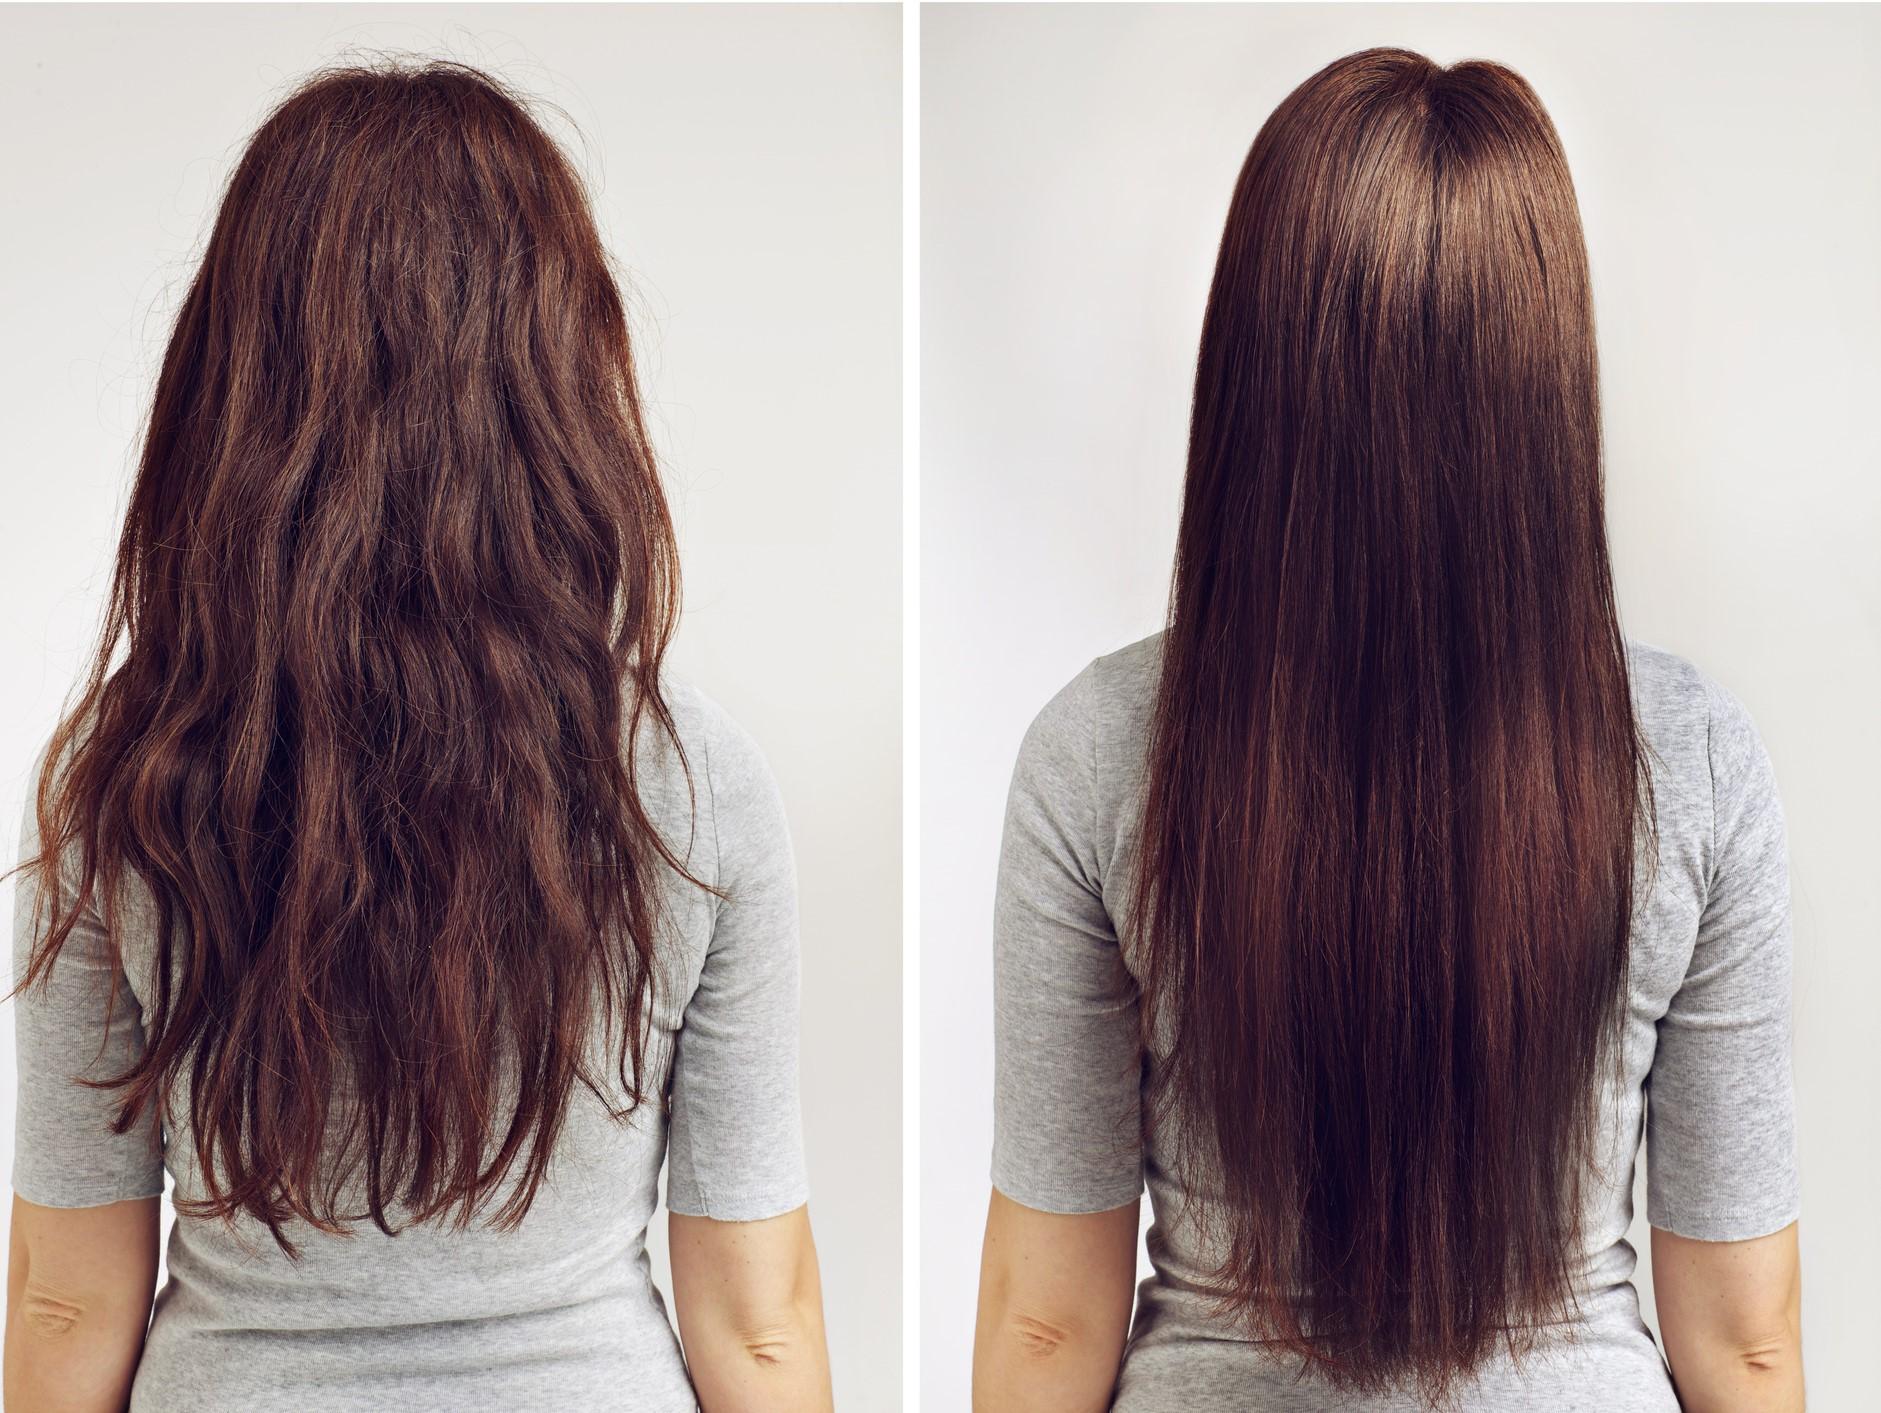 Permanent Hair Straightening  SoPostedcom